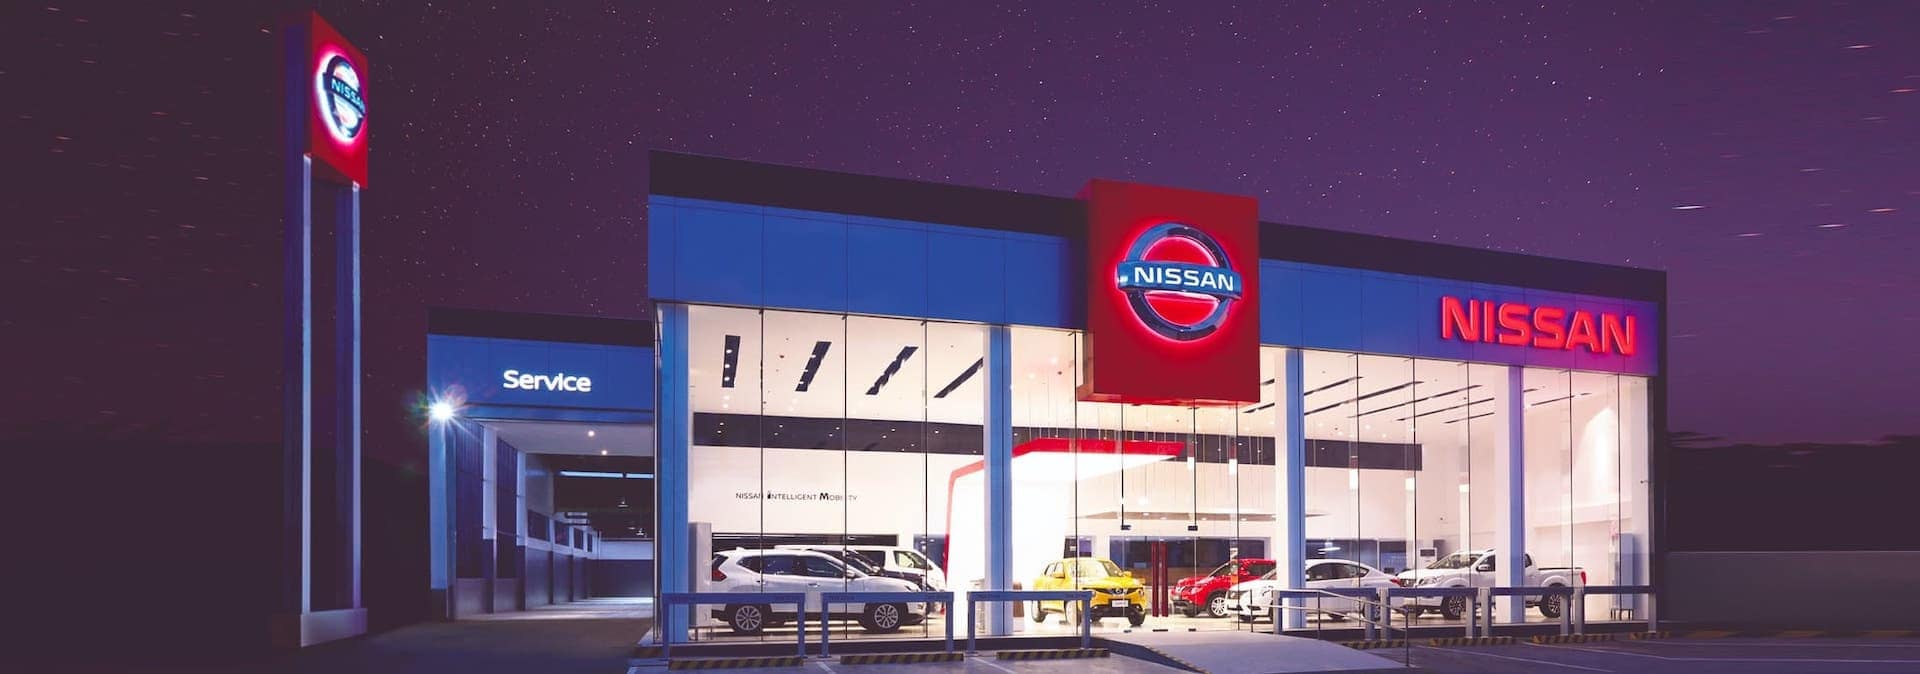 Nissan Dealership at Night